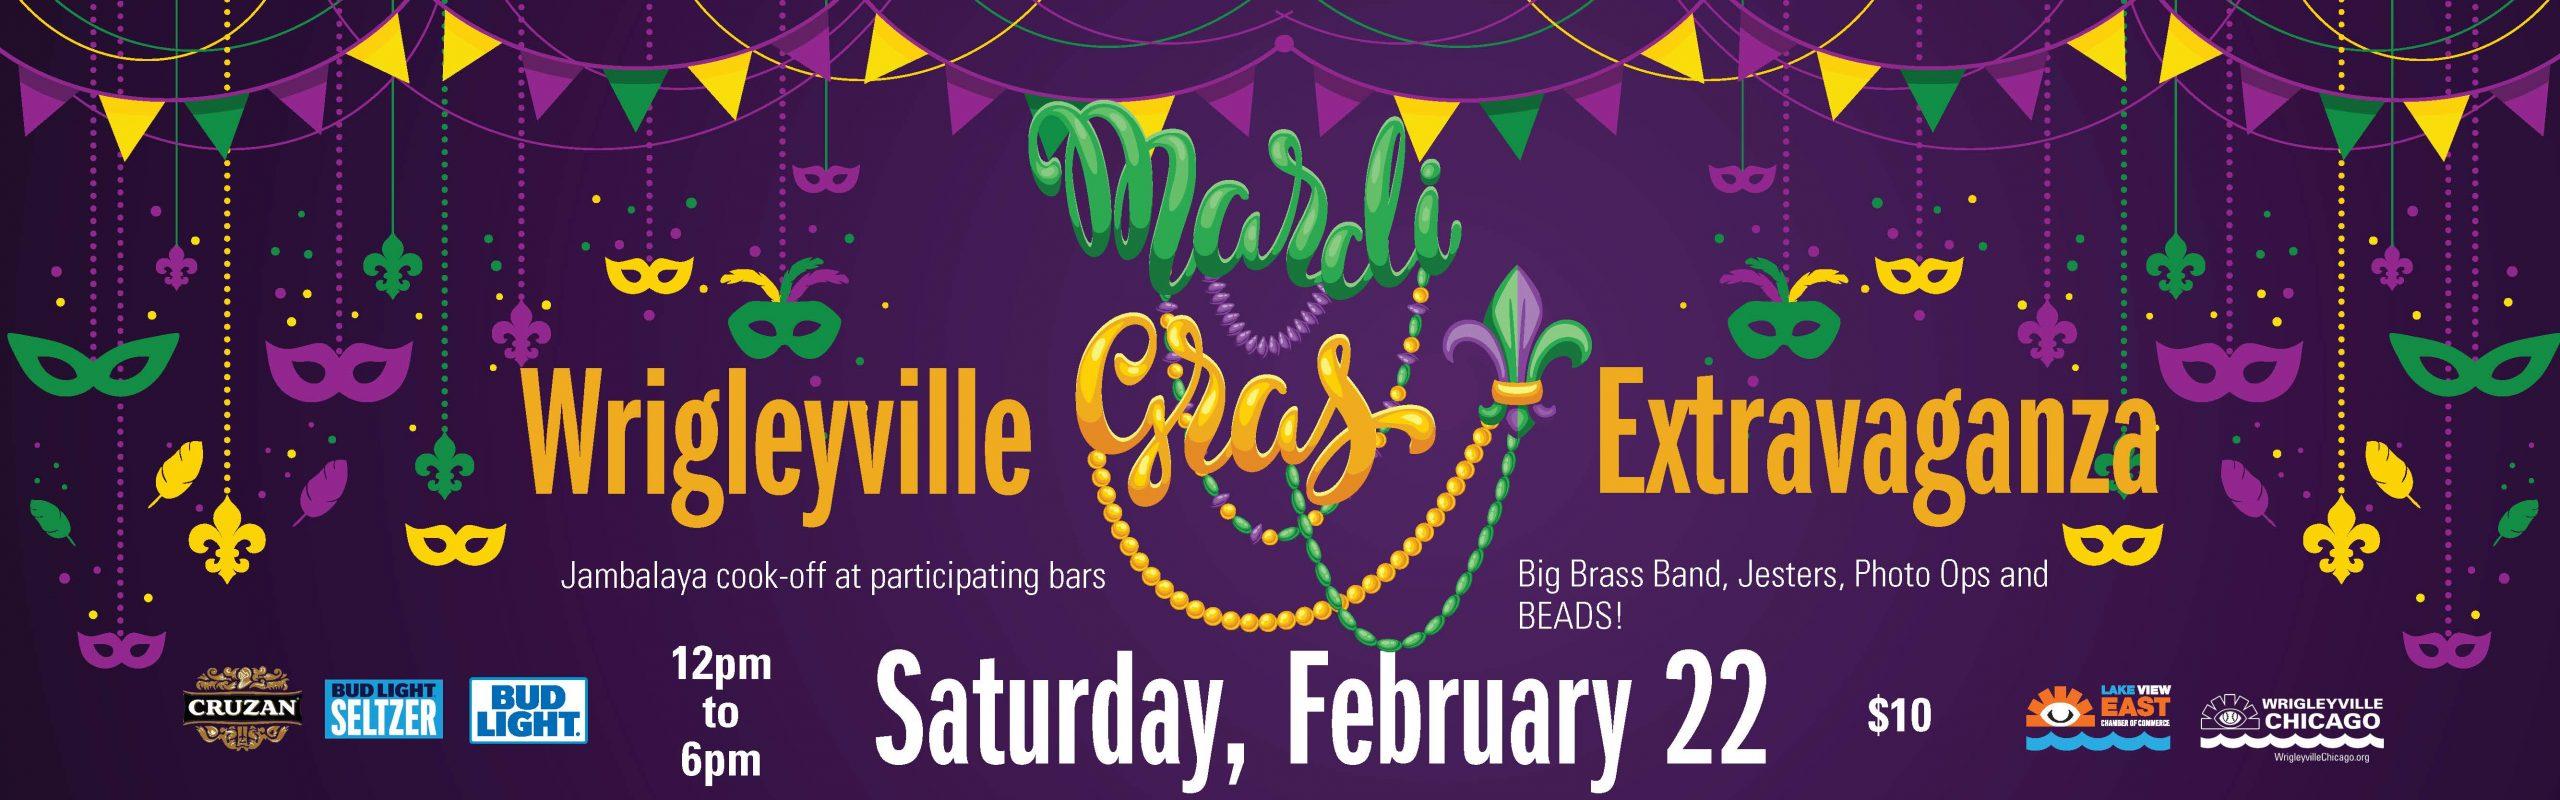 mardi gas wrigleyville